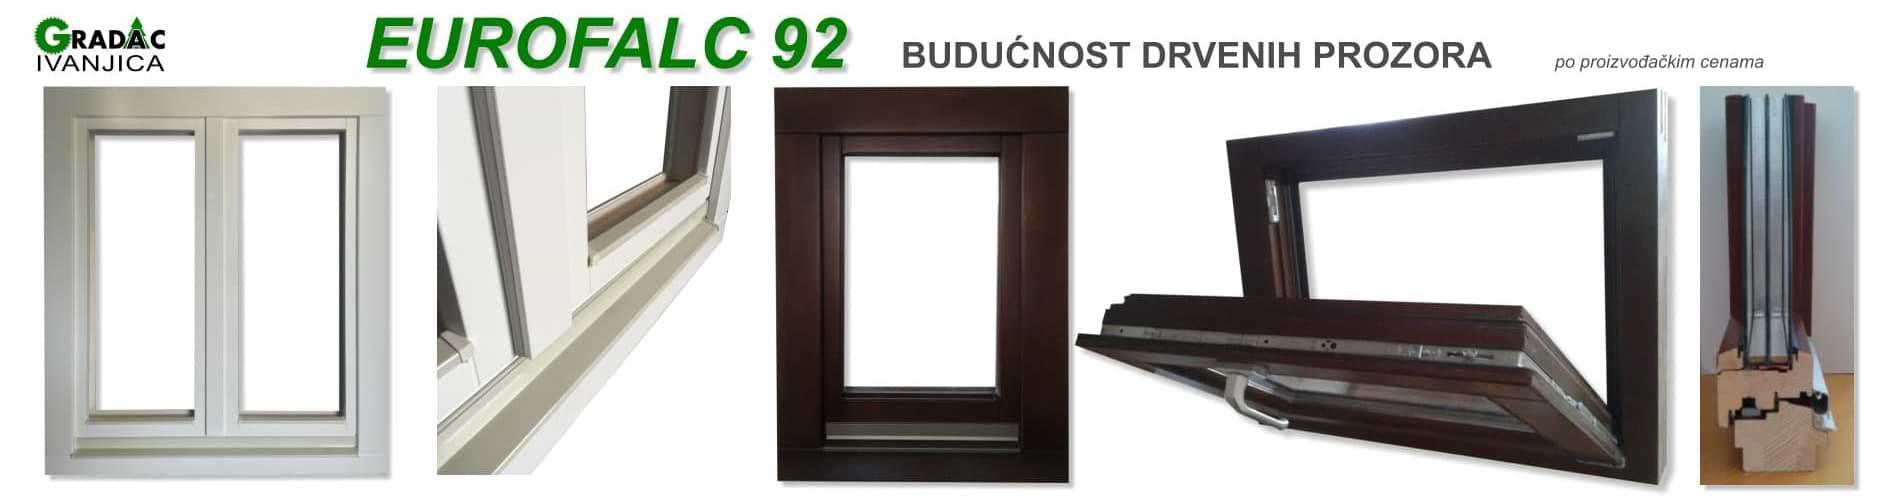 Eurofalc 92 drveni prozori